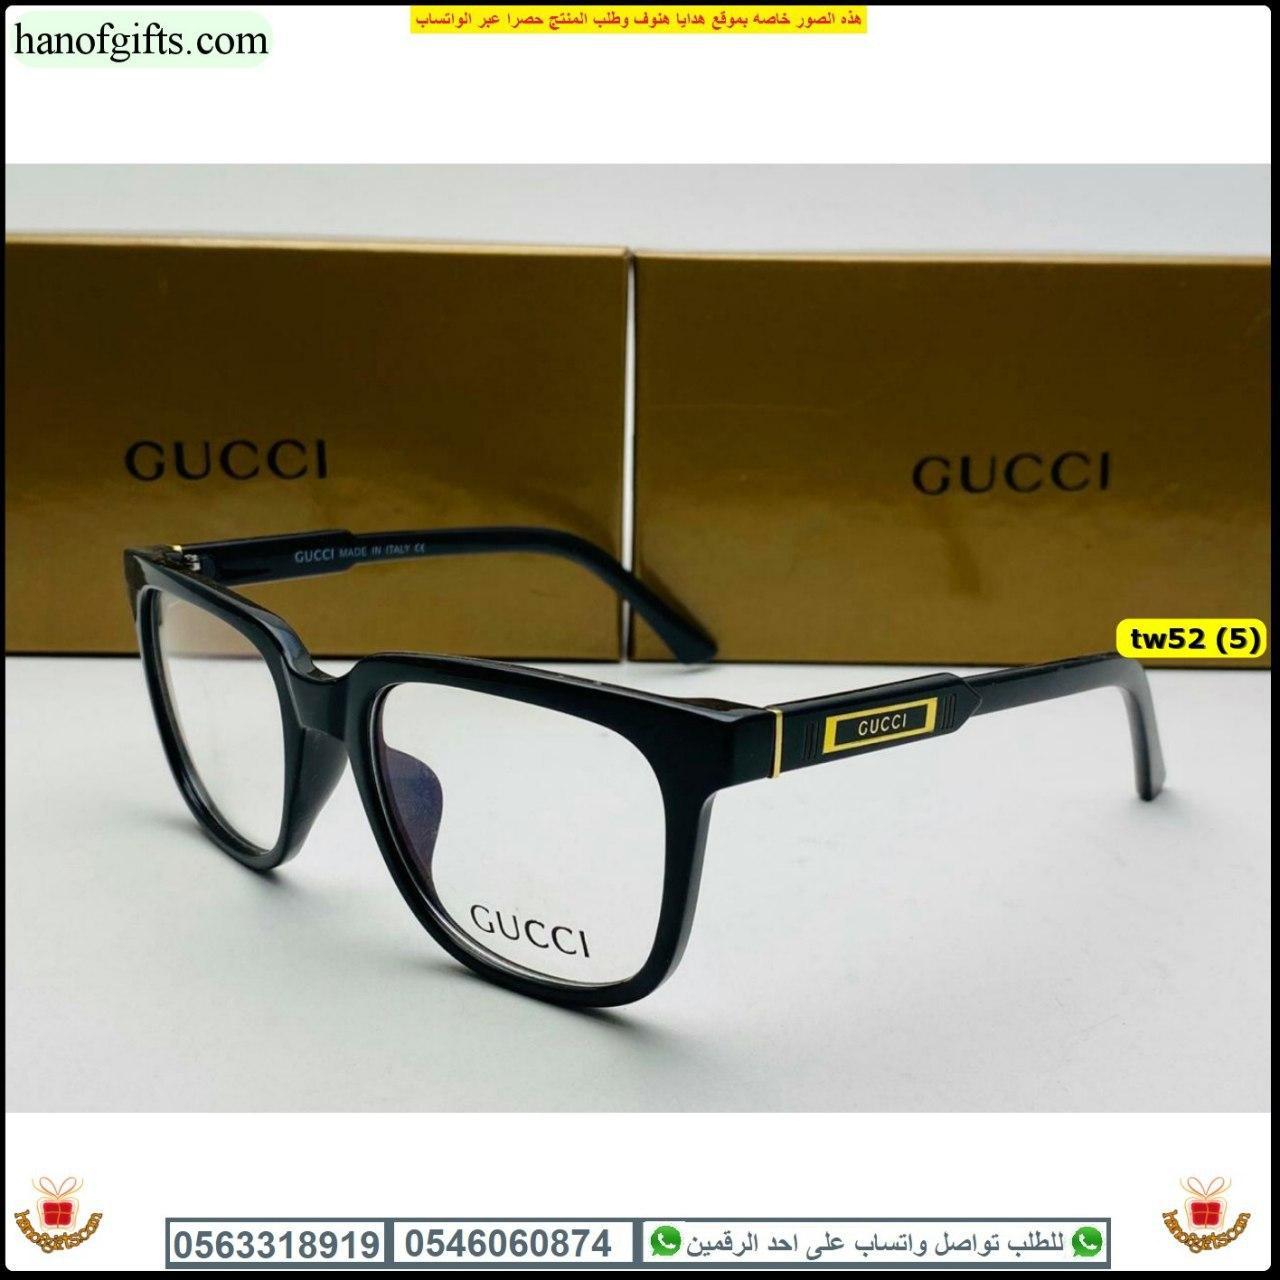 نظارات قوتشي الجديده